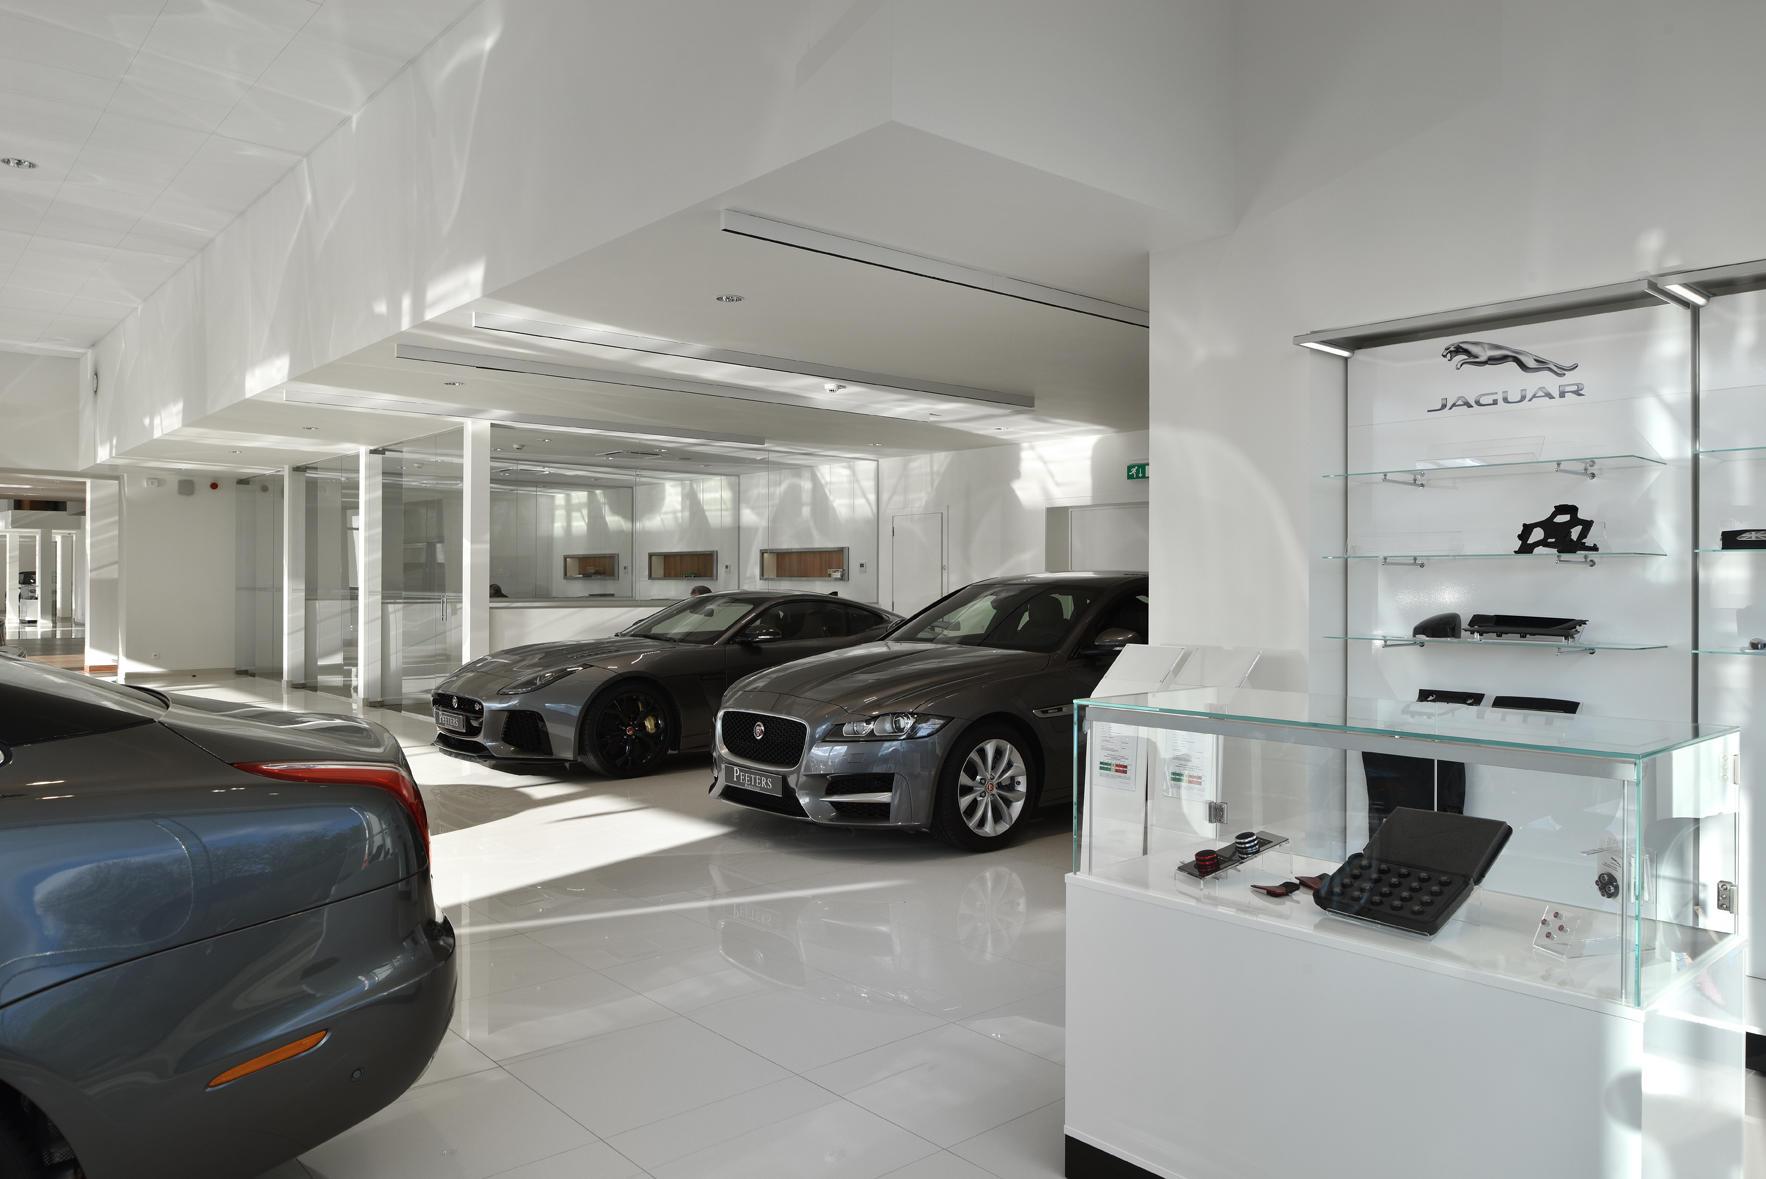 Garage W. Peeters